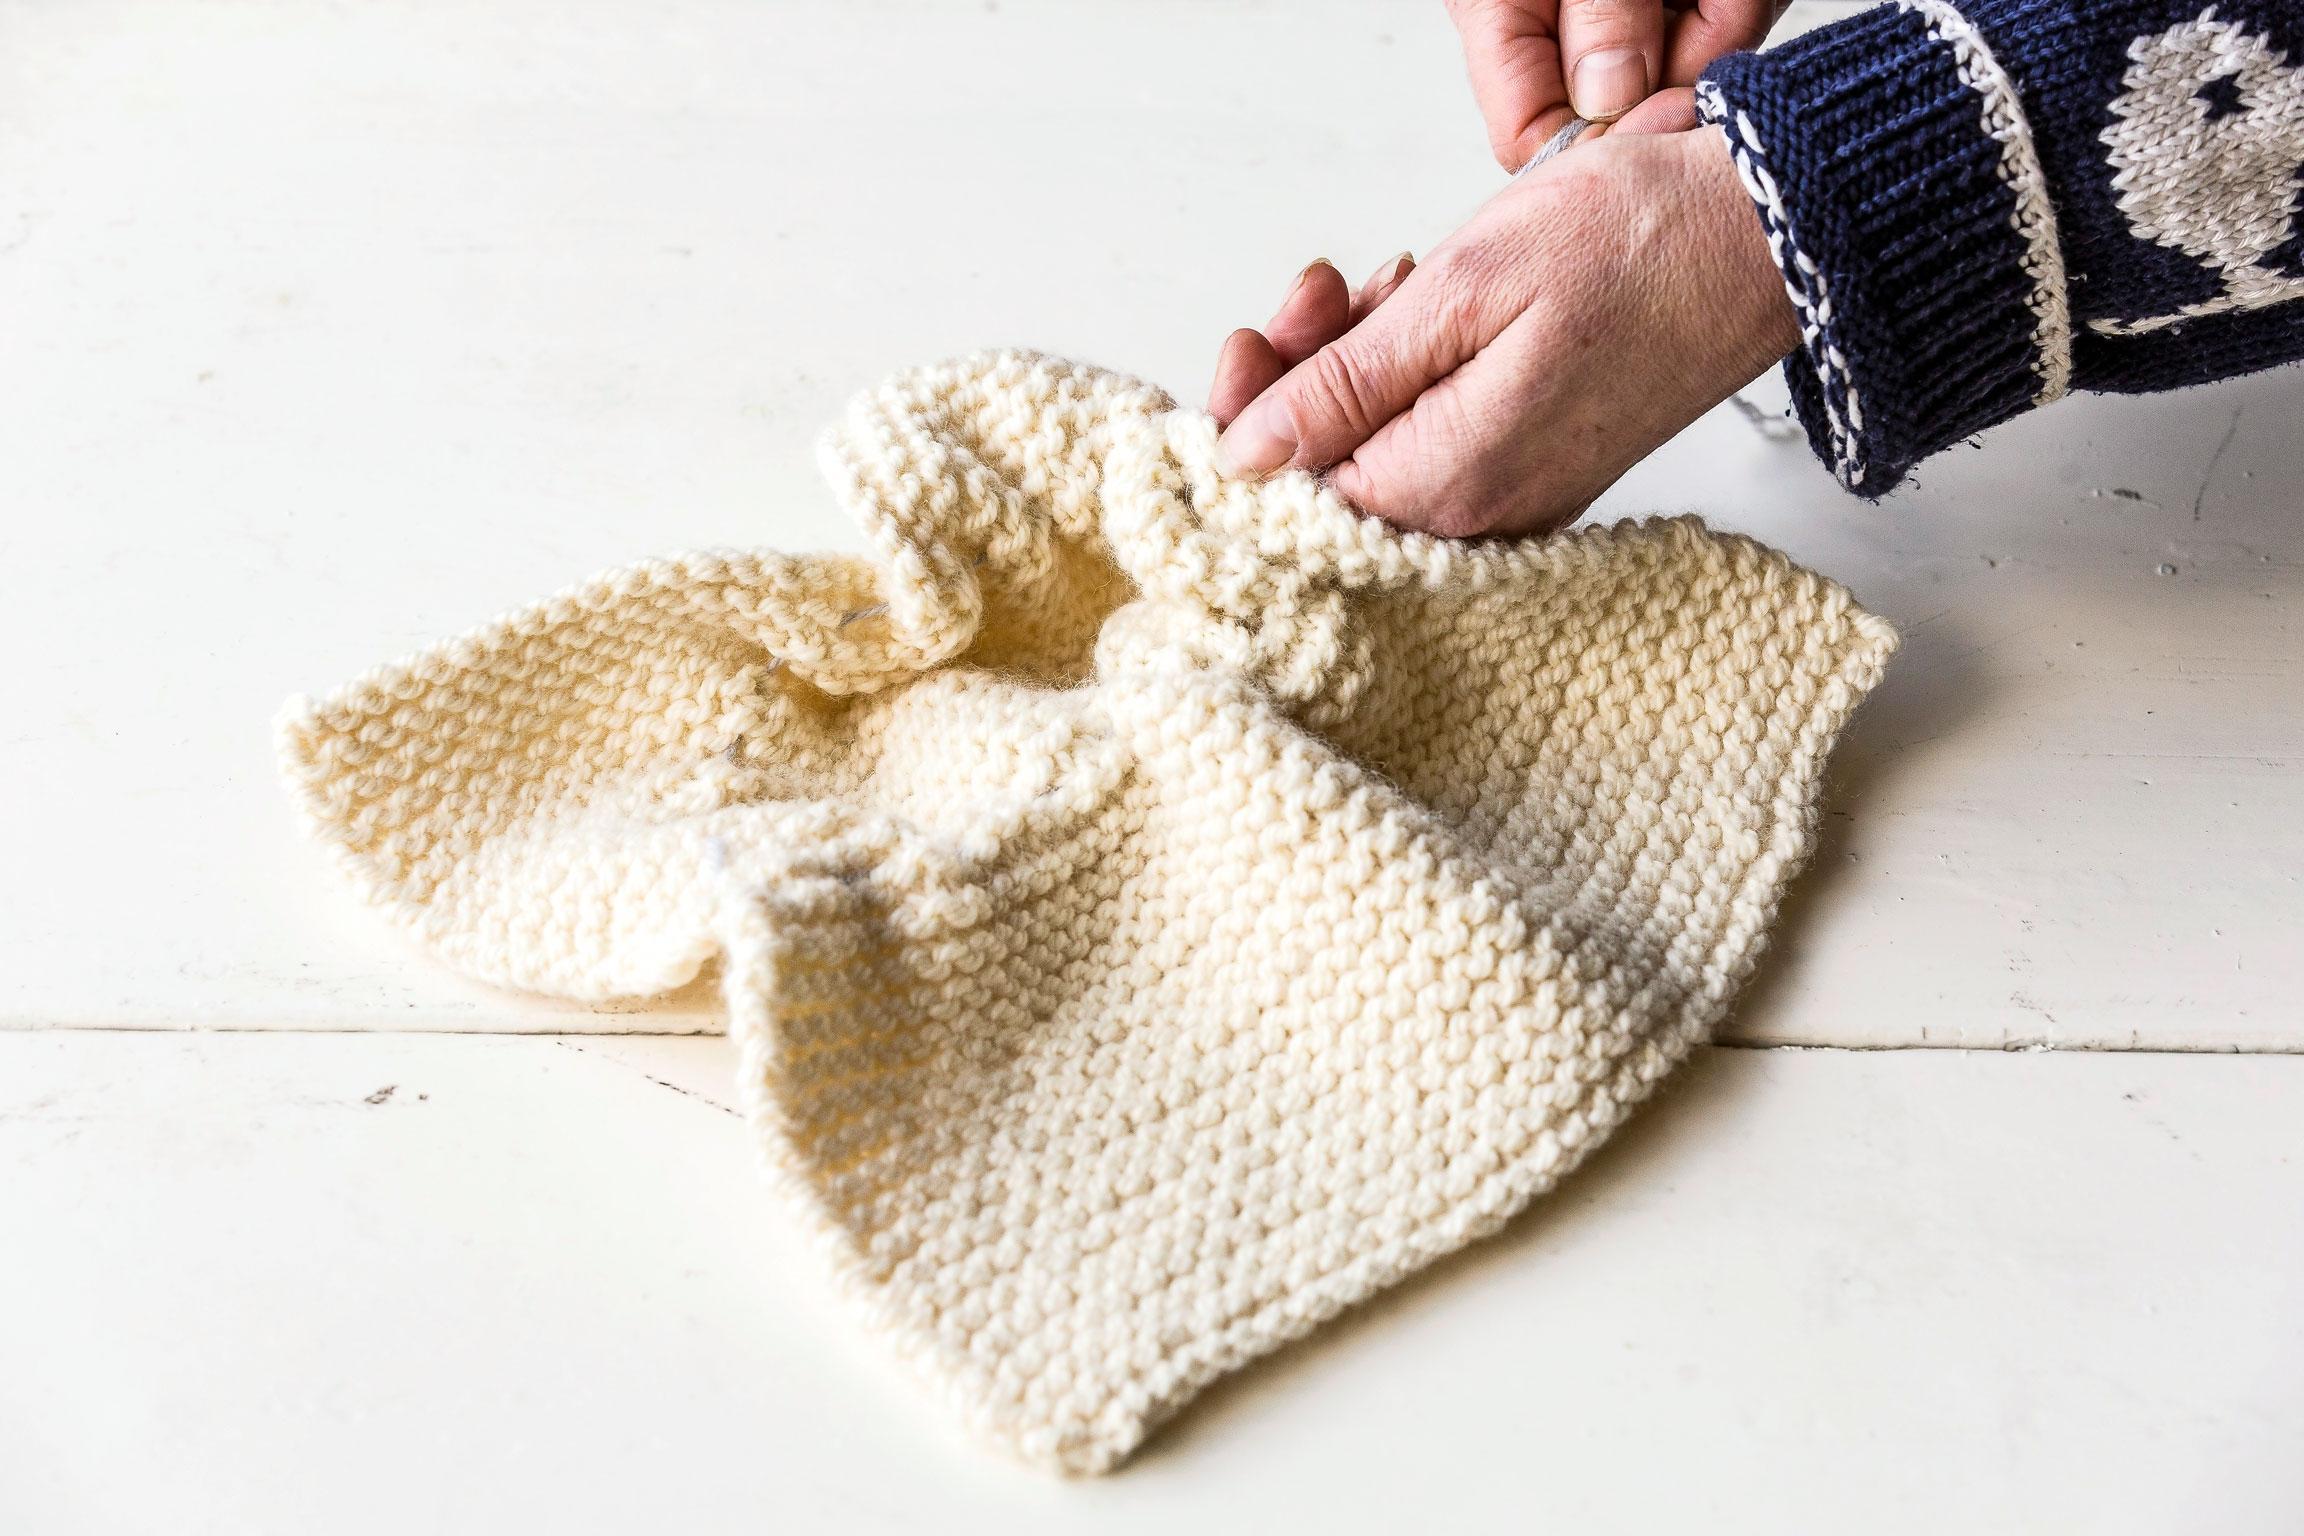 Craft-project-fabric-bunnies-2.jpg